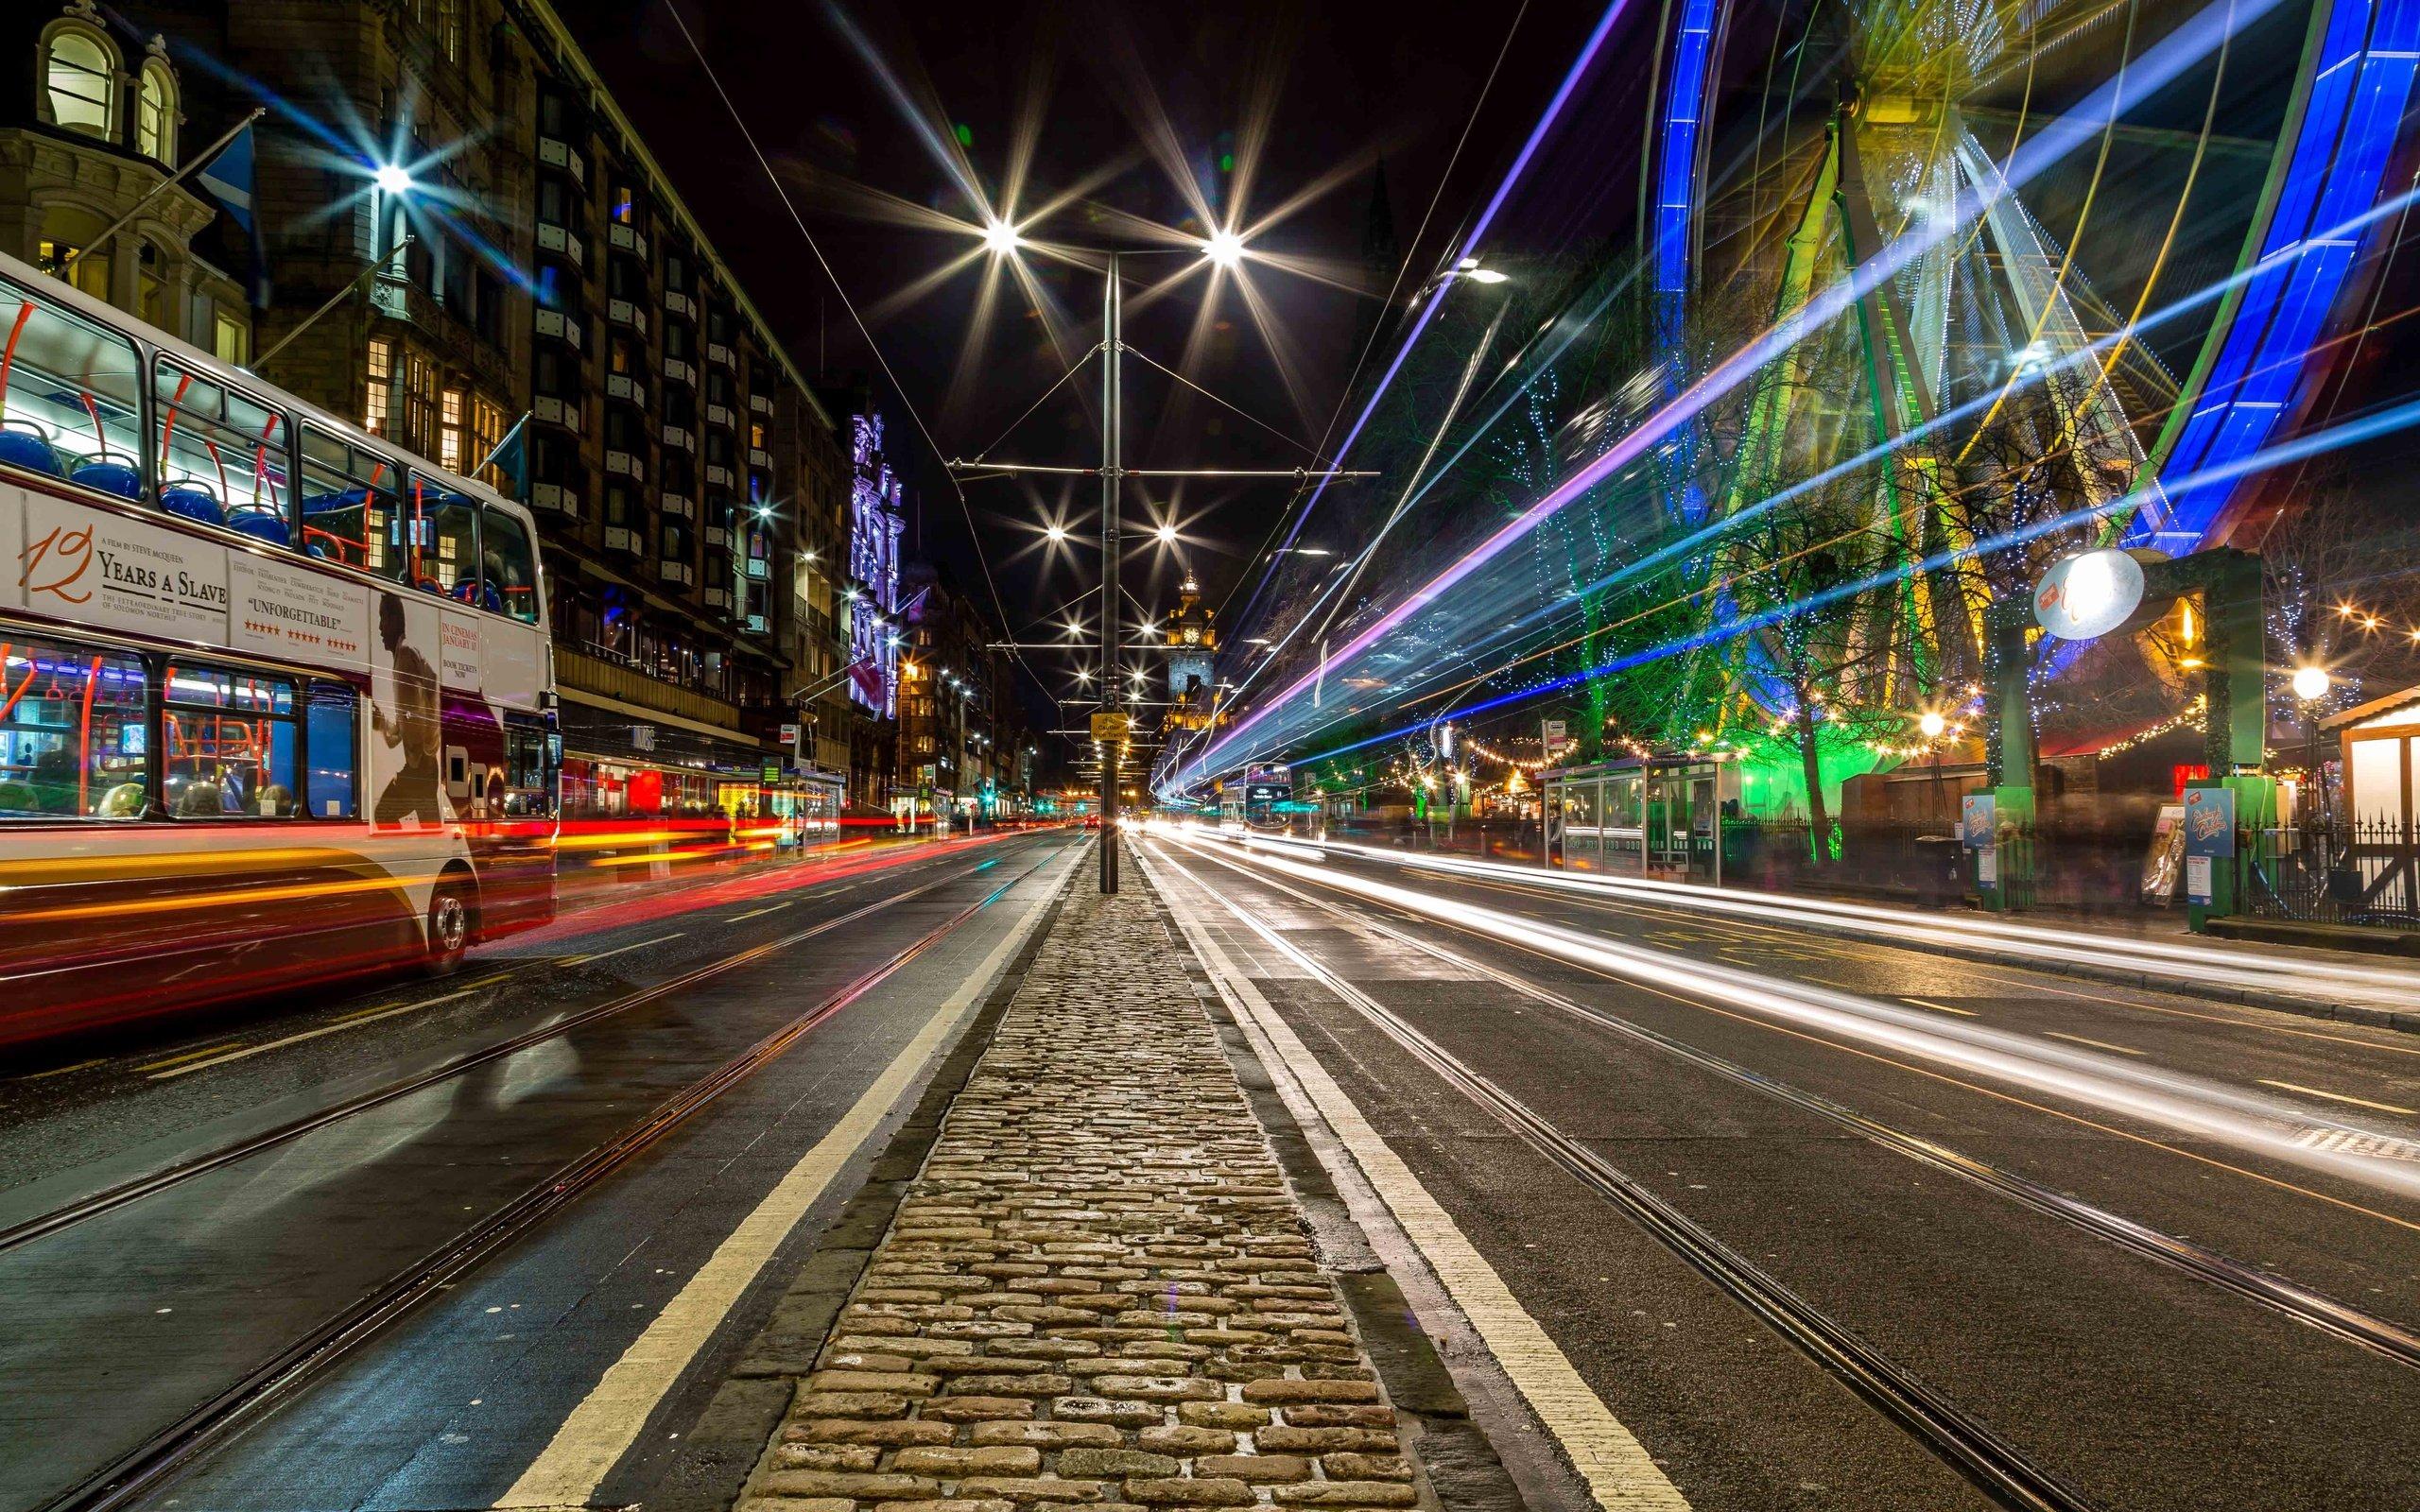 Edinburgh City Night Road City Wallpaper - City Highway Background Hd -  2560x1600 - Download HD Wallpaper - WallpaperTip